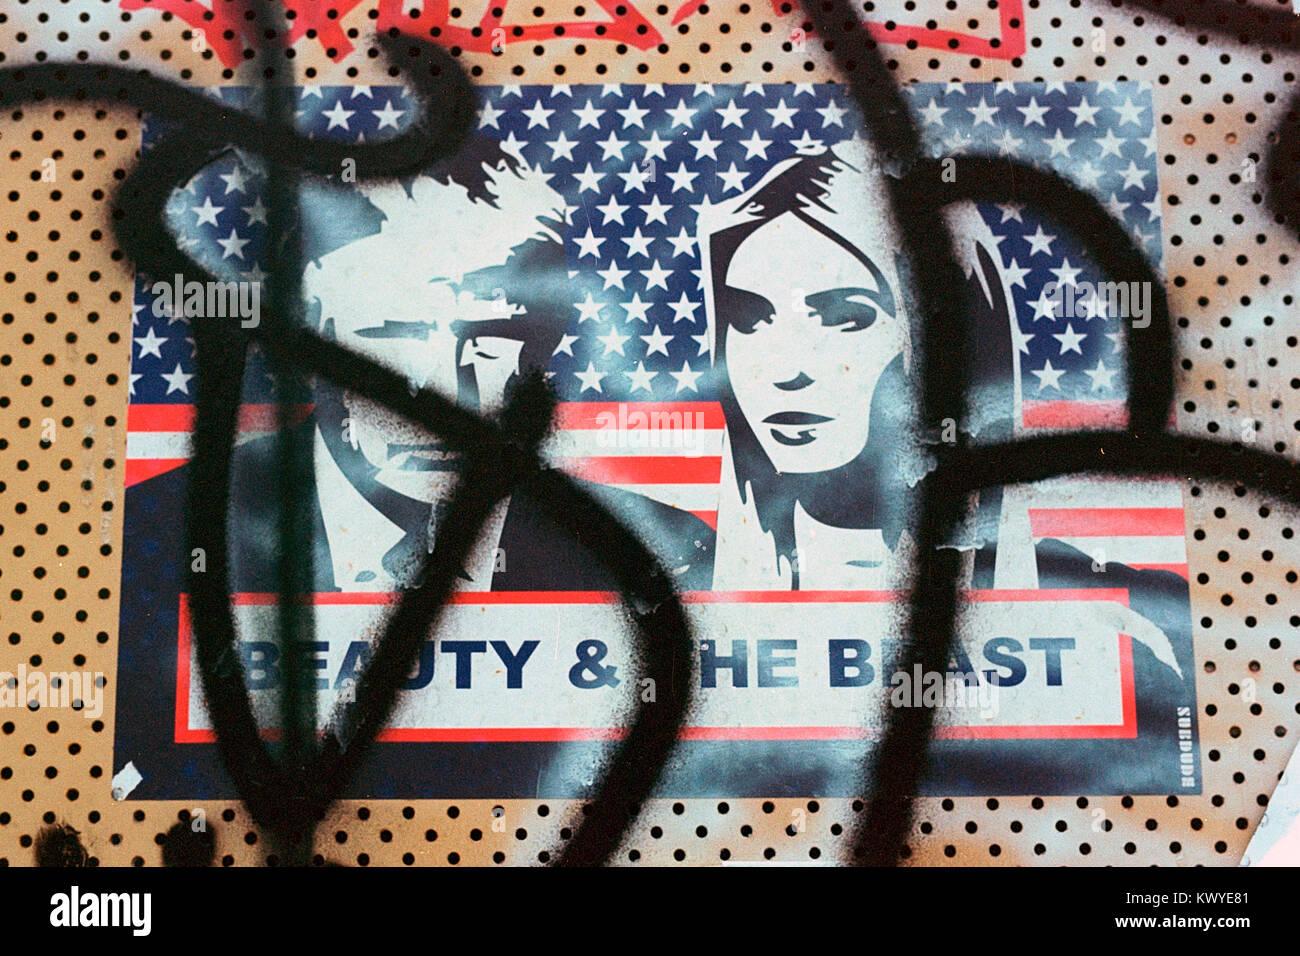 street art poster photos & street art poster images - alamy